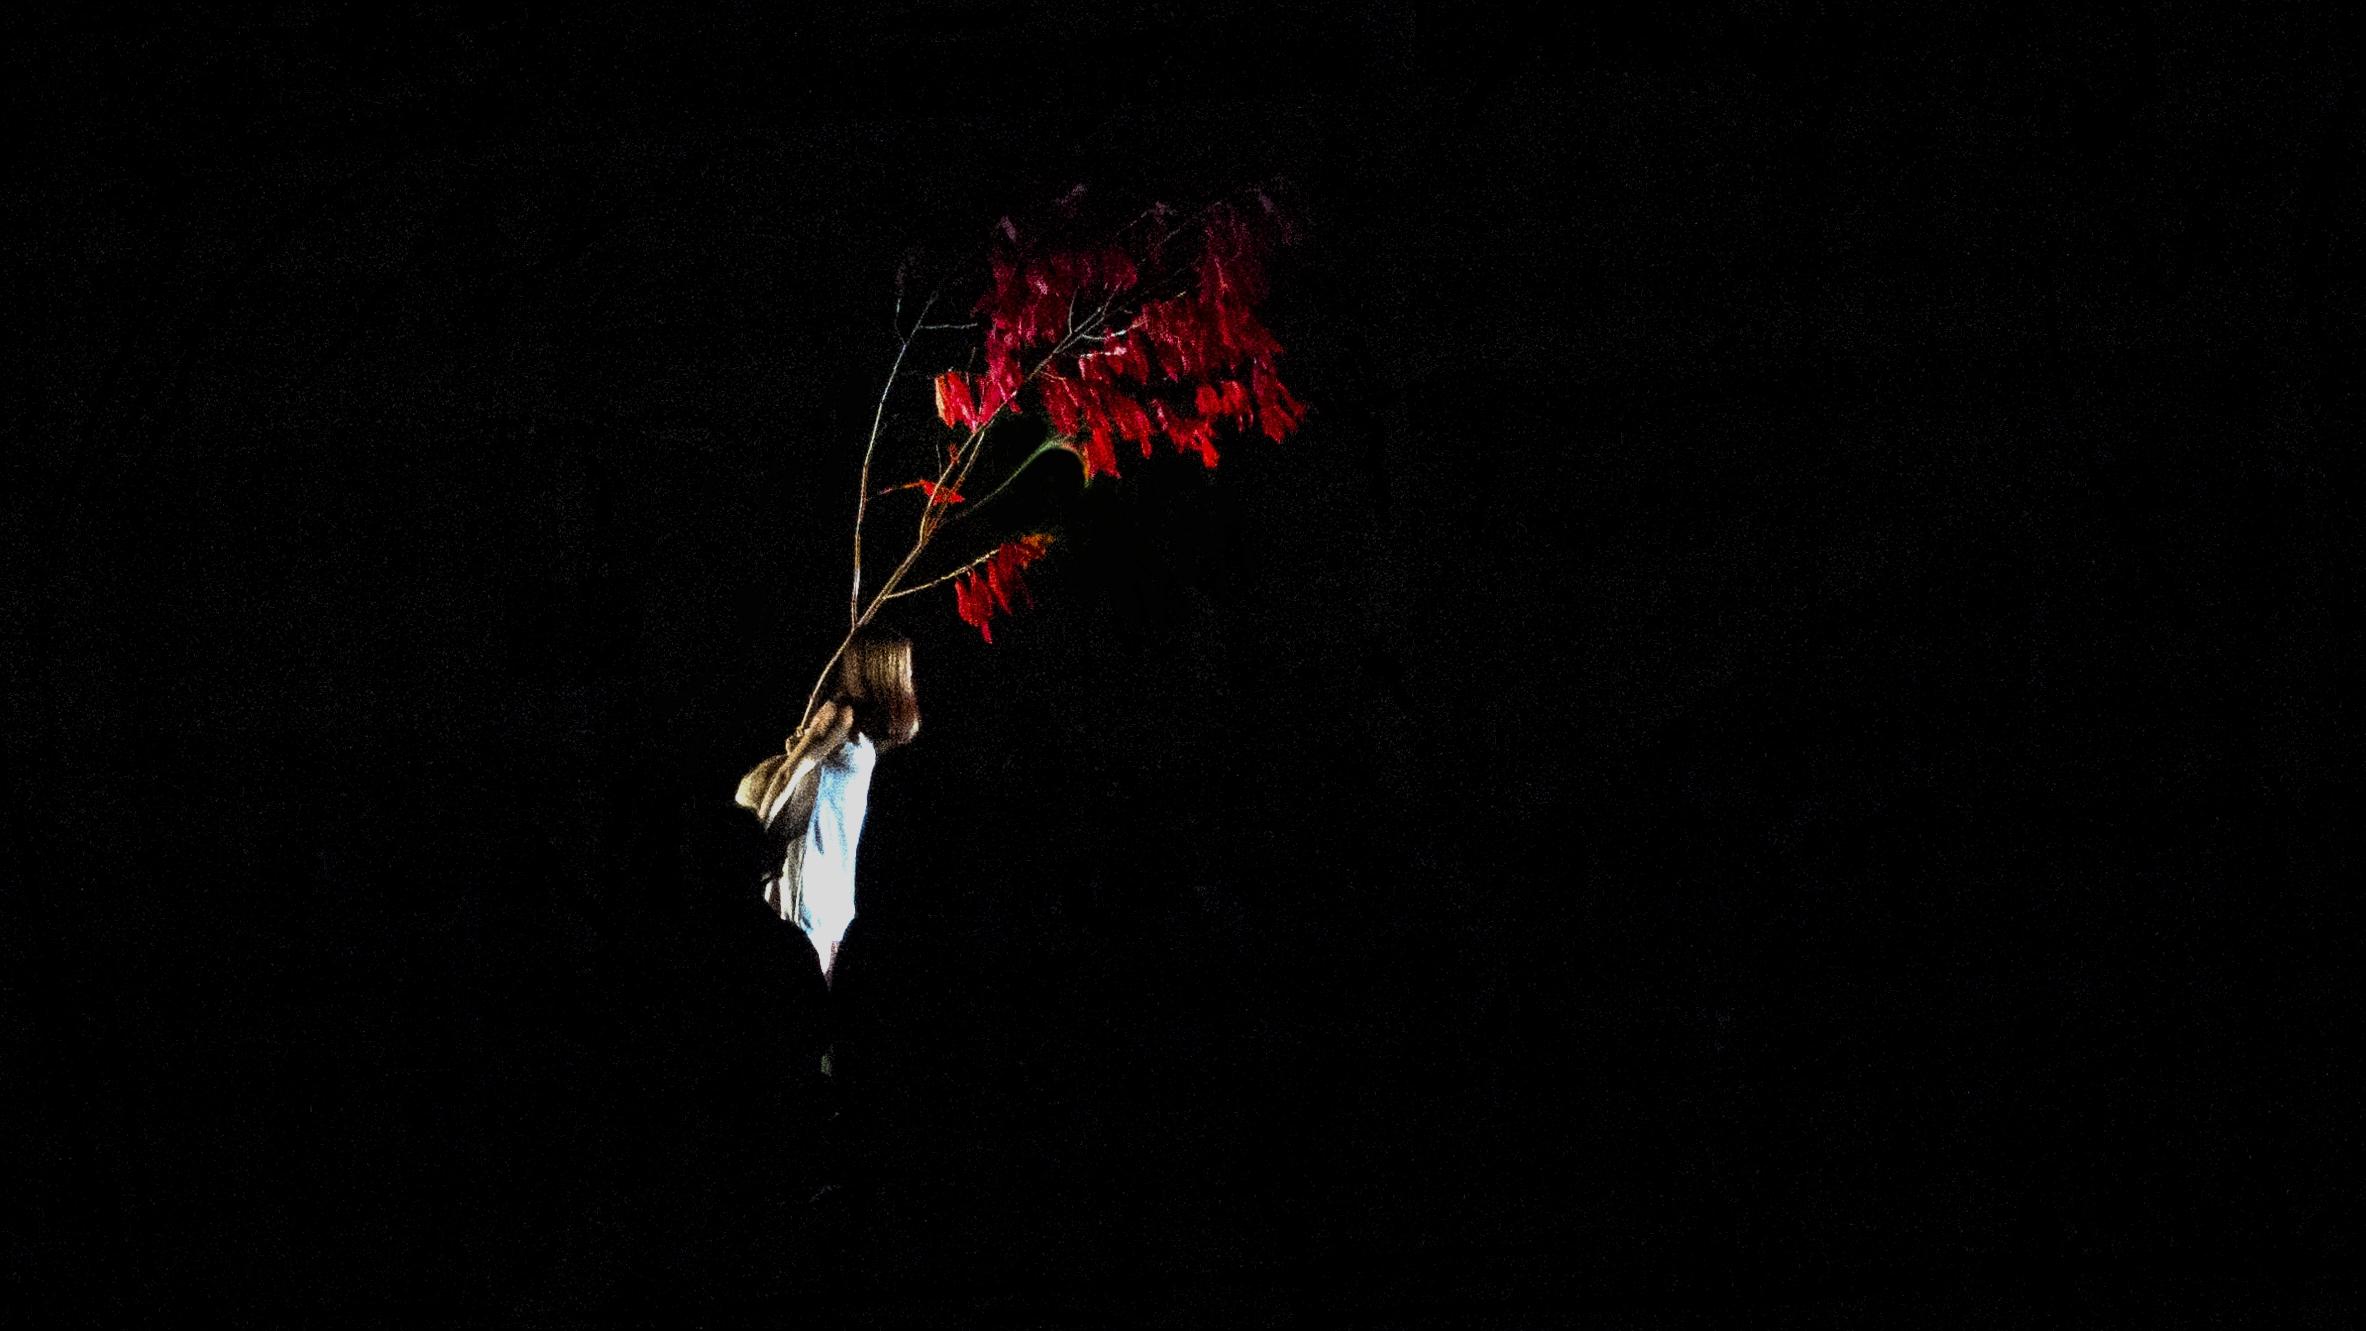 Photo 22-6-18, 9 28 10 pm.jpg